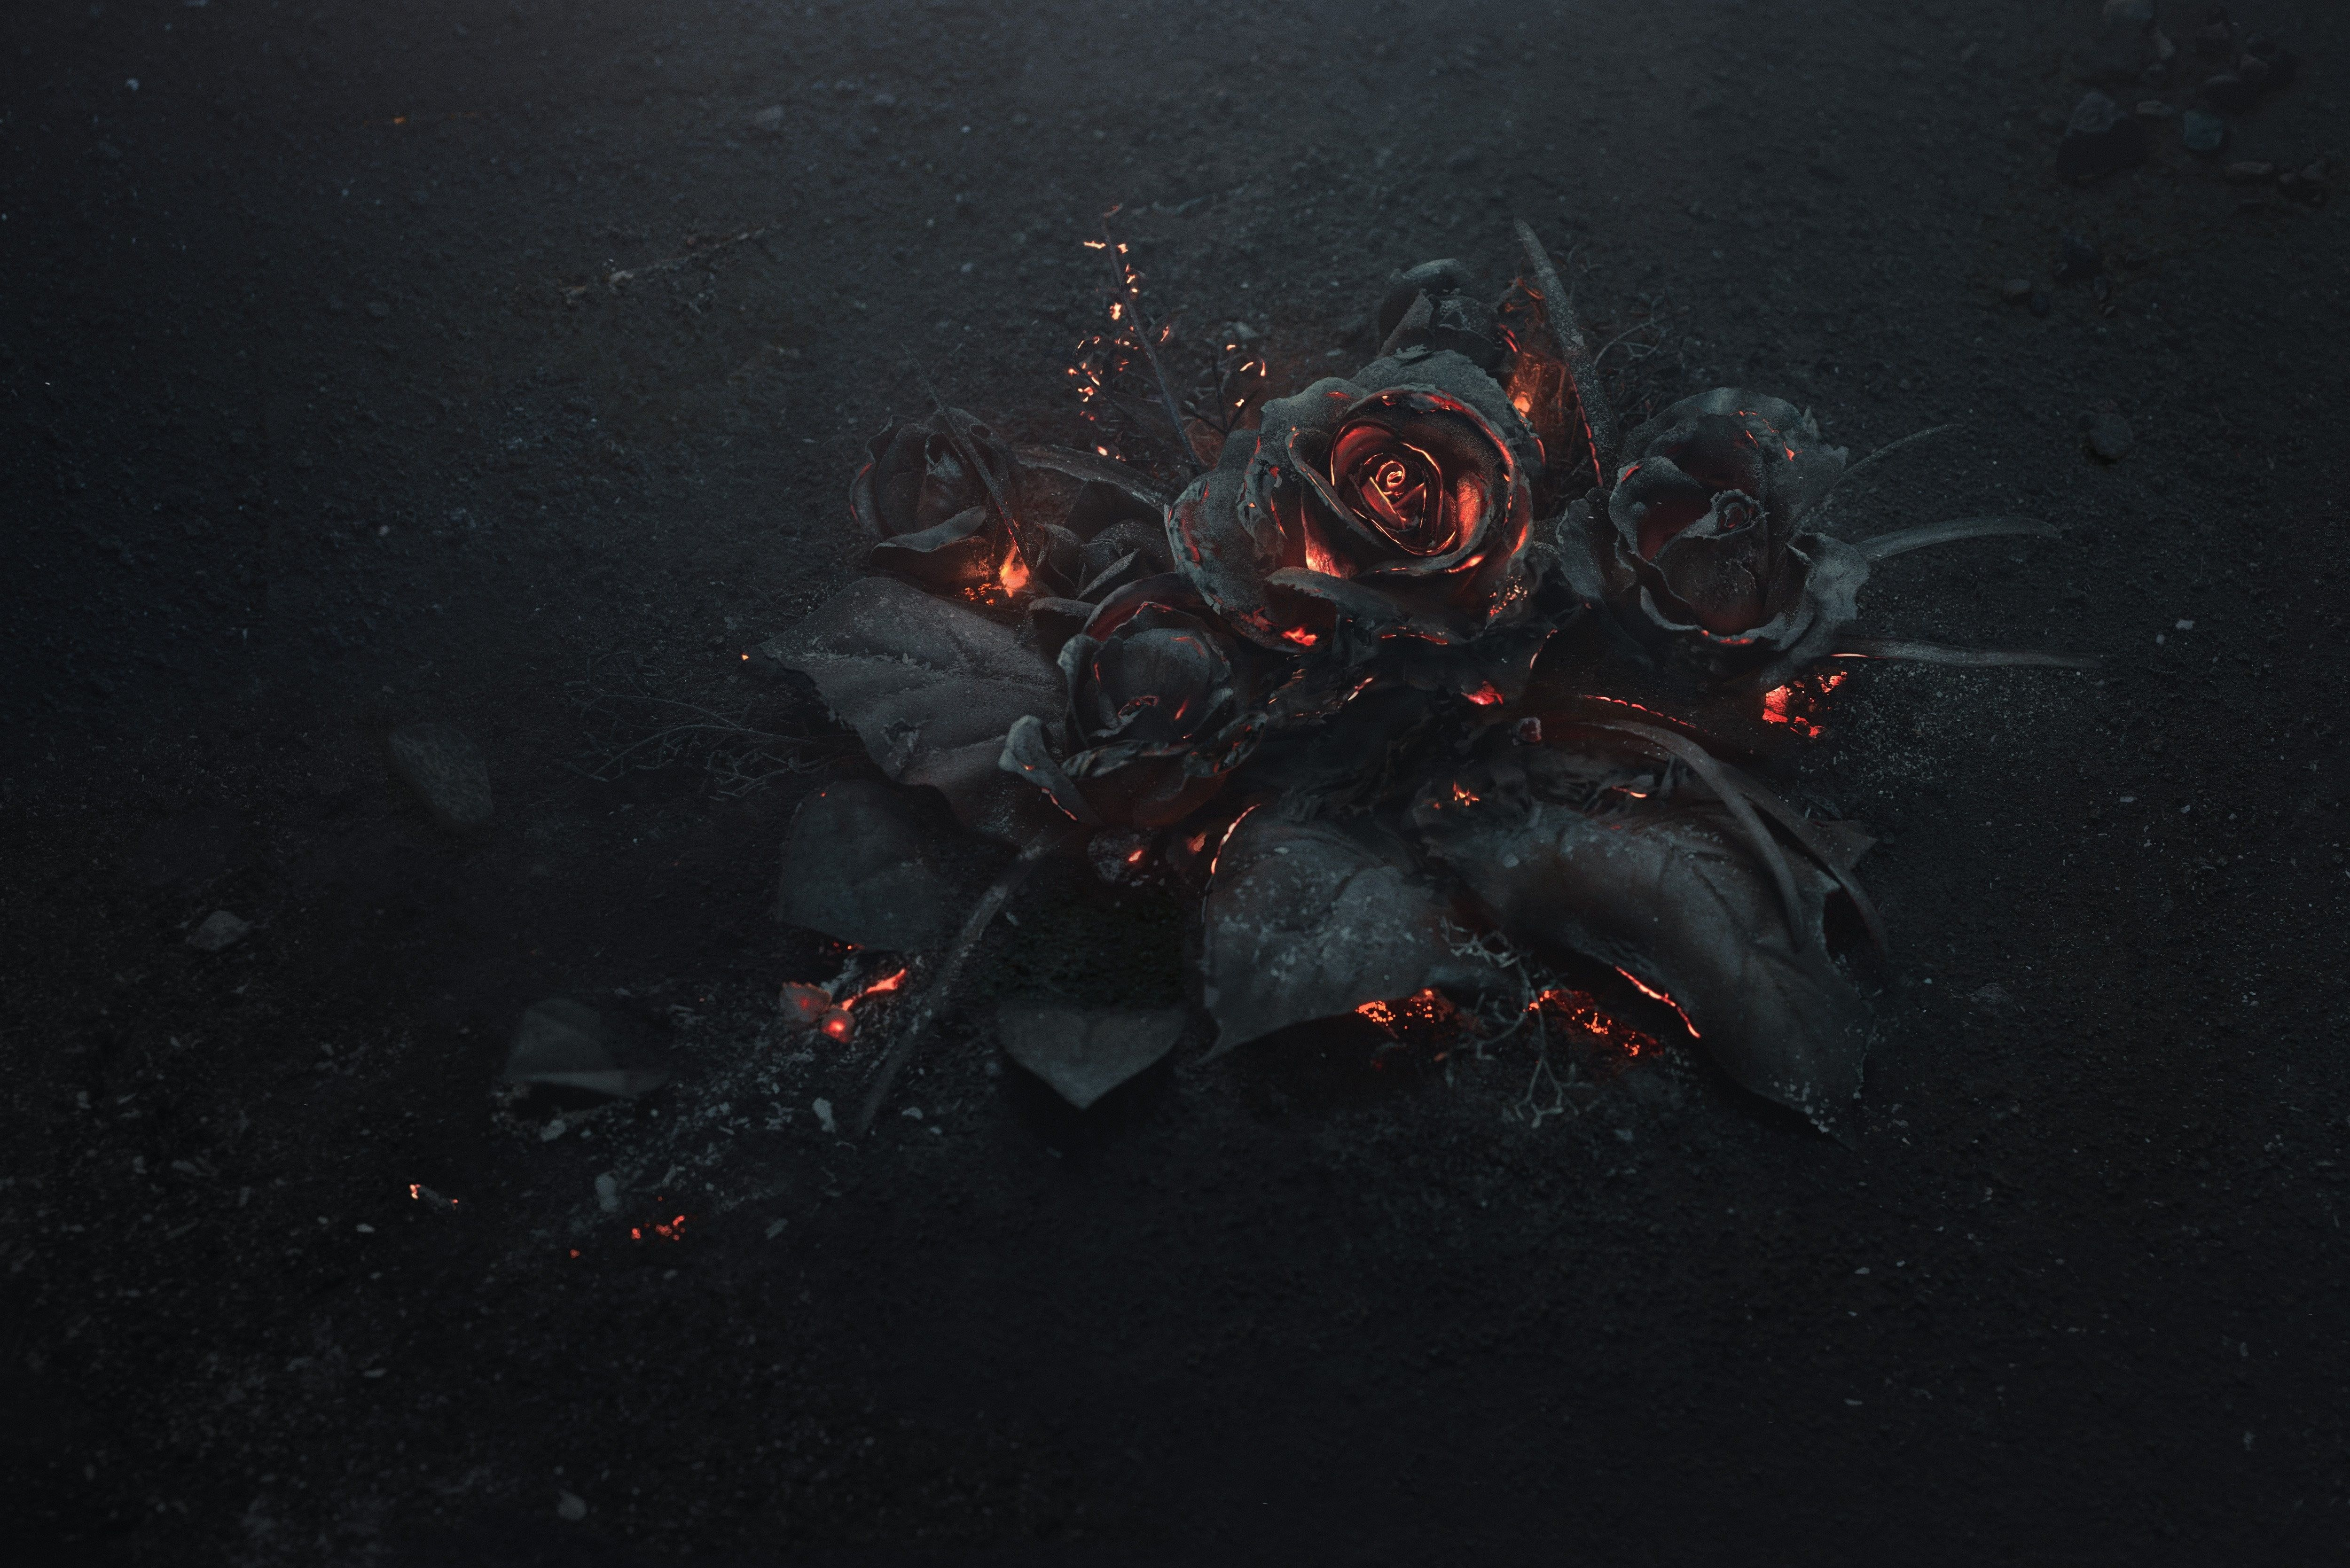 Wallpaper Black Rose Illustration Ash Burning Abstract Dark Flowers In 2020 Dark Wallpaper Rose Illustration Simple Wallpapers